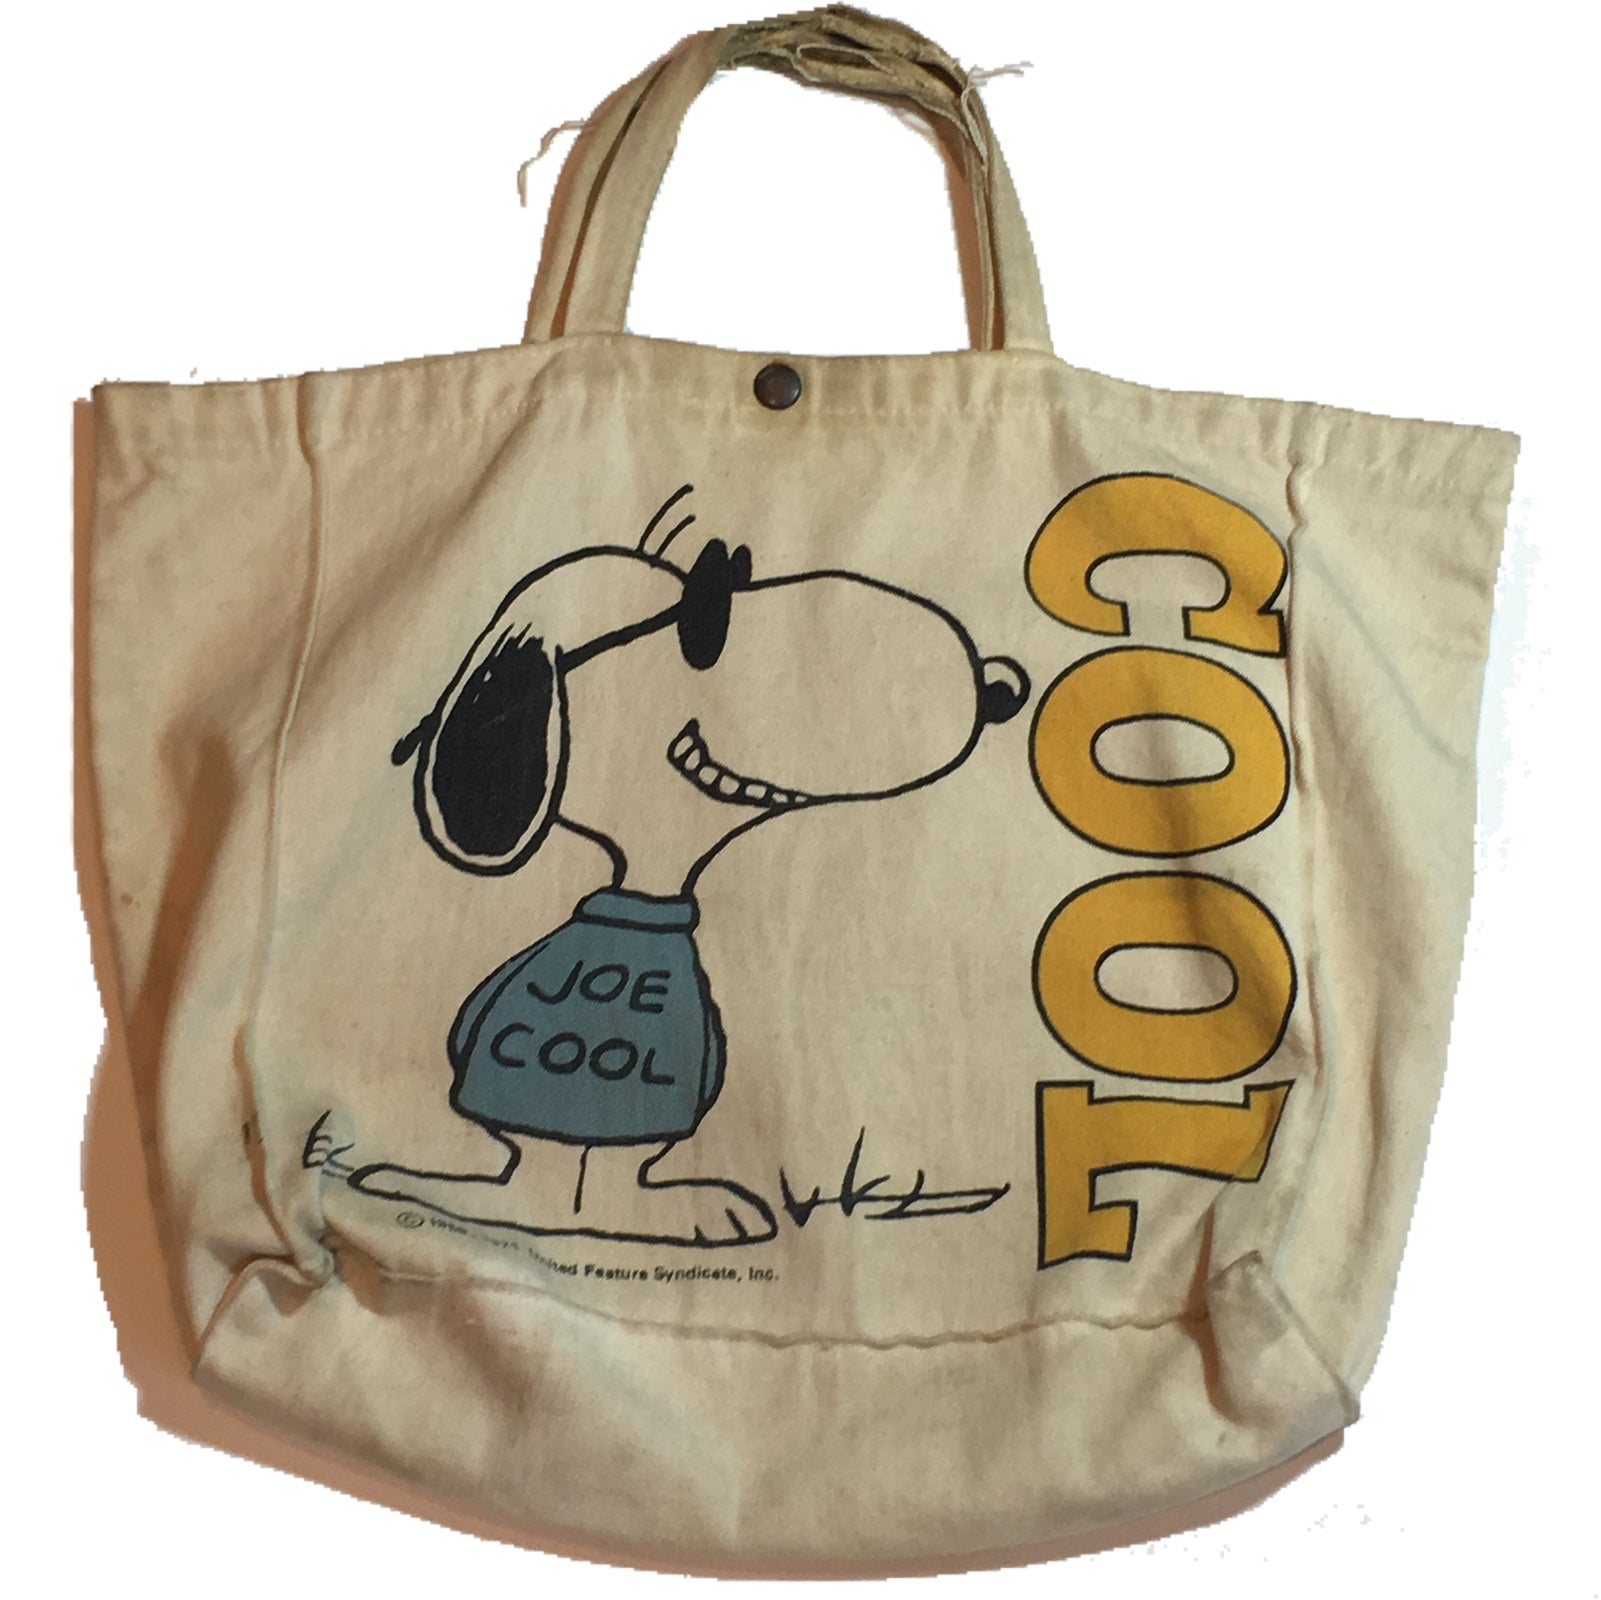 Image of Joe cool snoopy tote bag